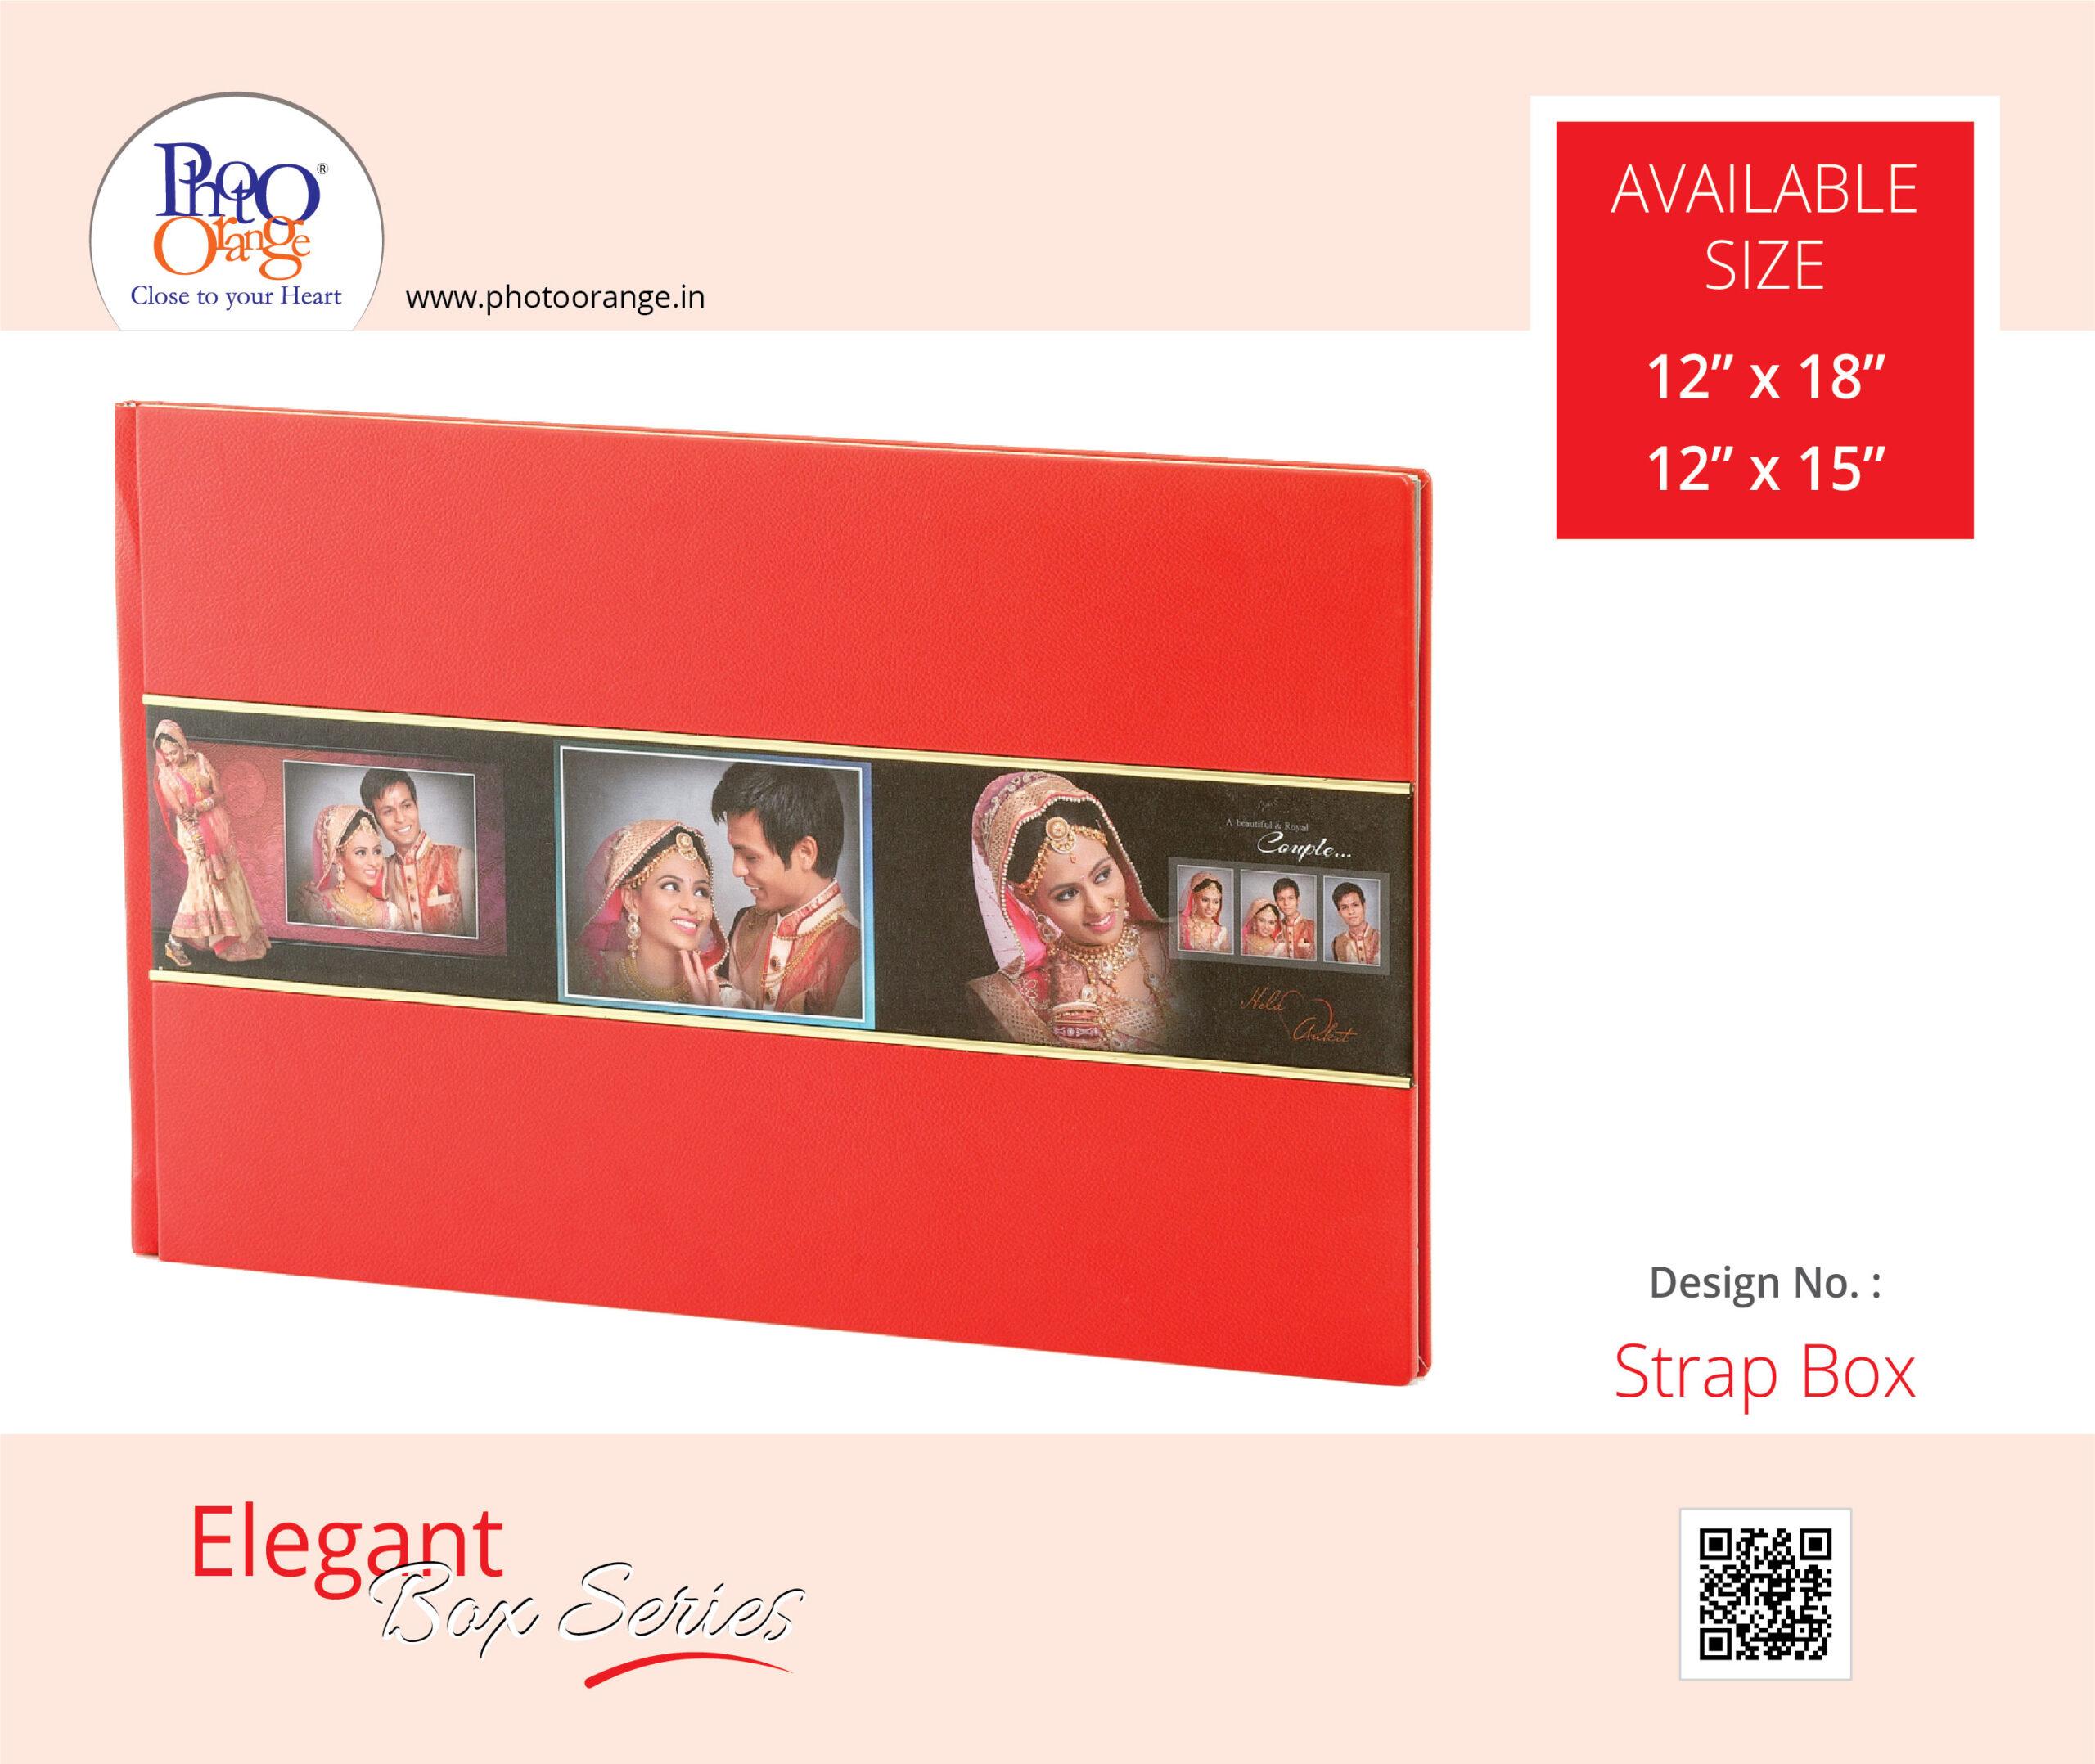 Strap Box